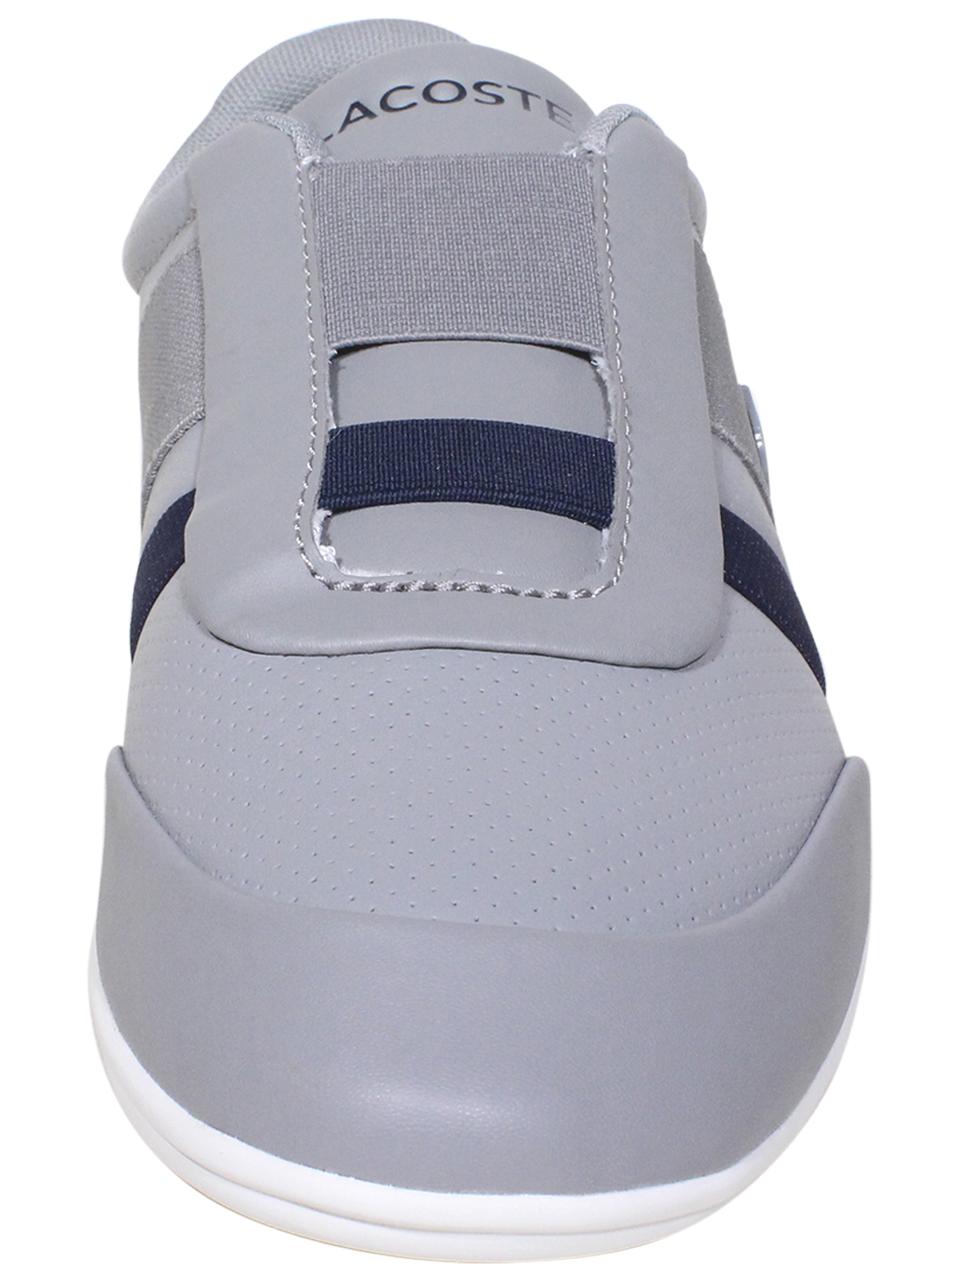 Lacoste-Misano-Elastic-318-Sneakers-Men-039-s-Low-Top-Shoes thumbnail 9